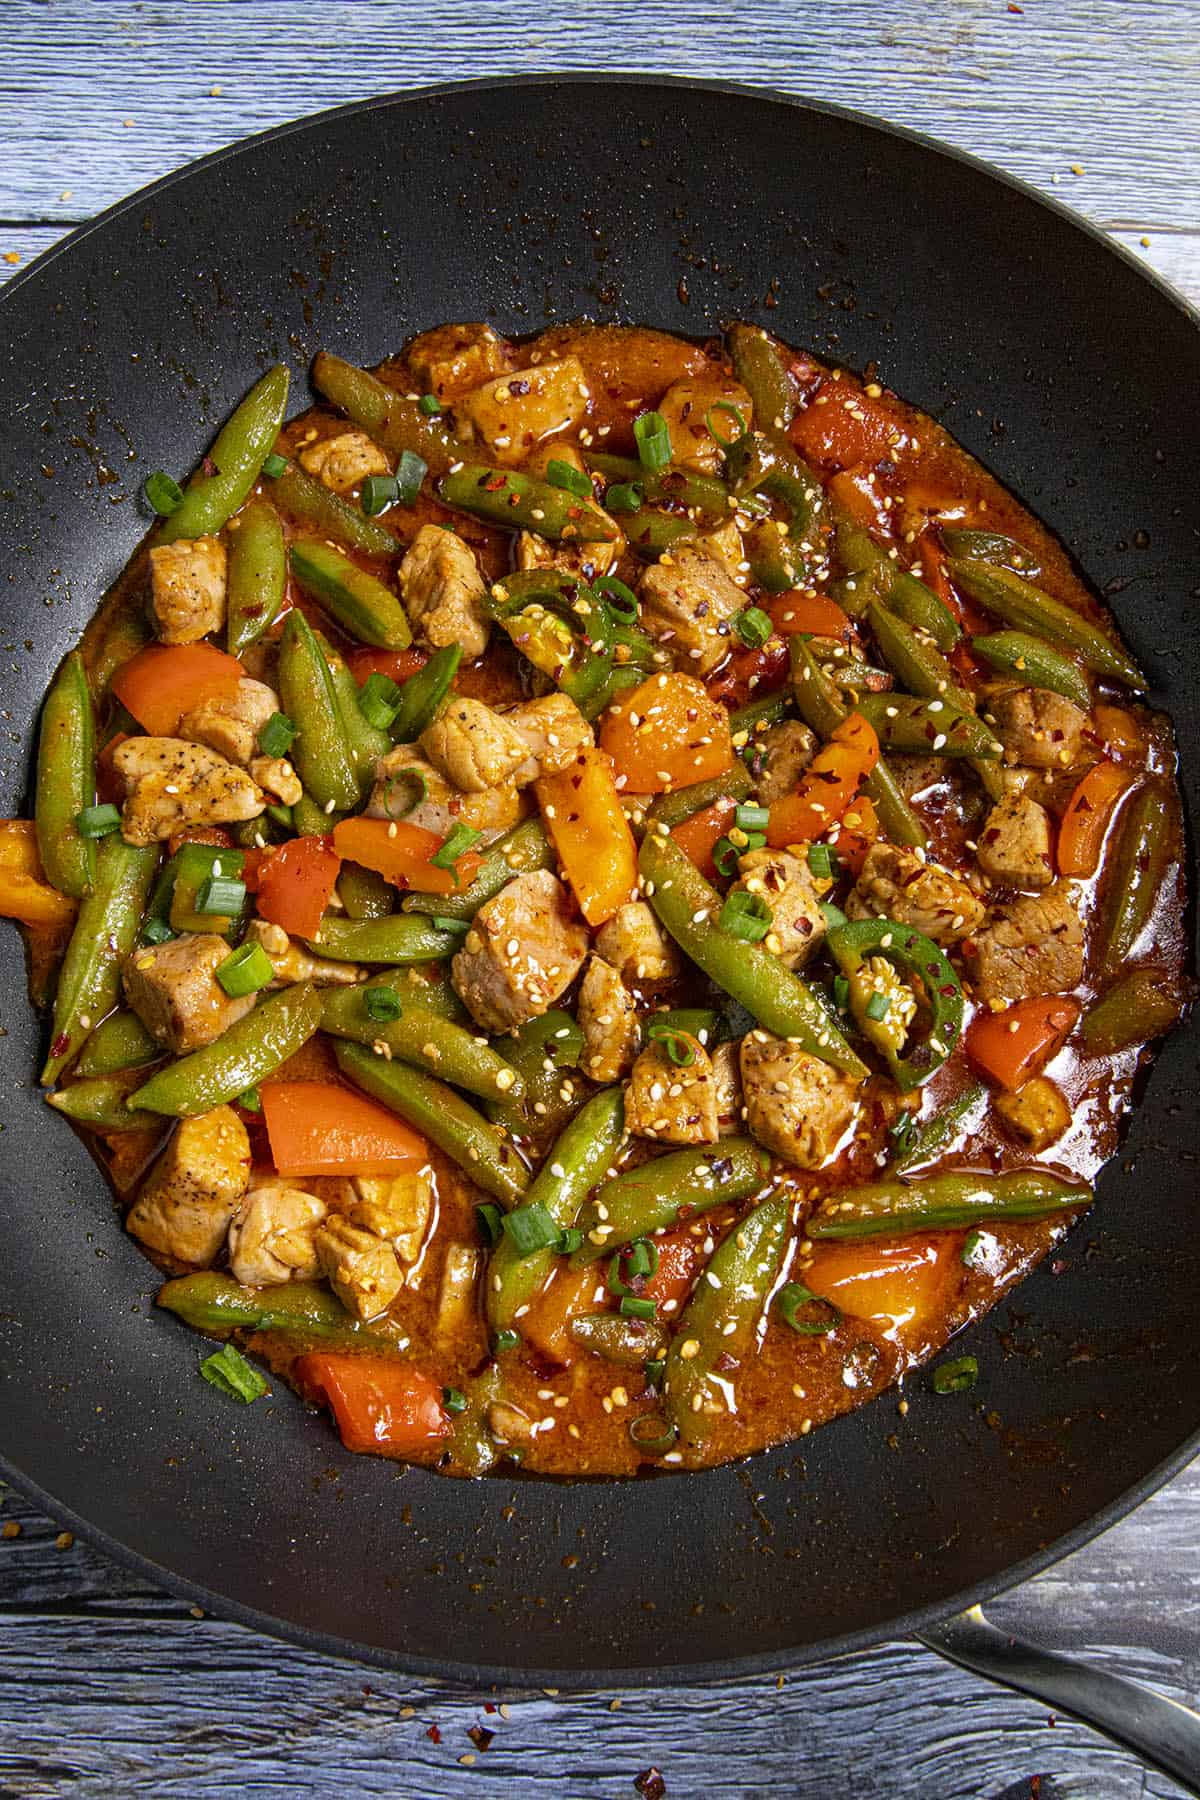 Spicy Pork Stir Fry in a pan with garnish